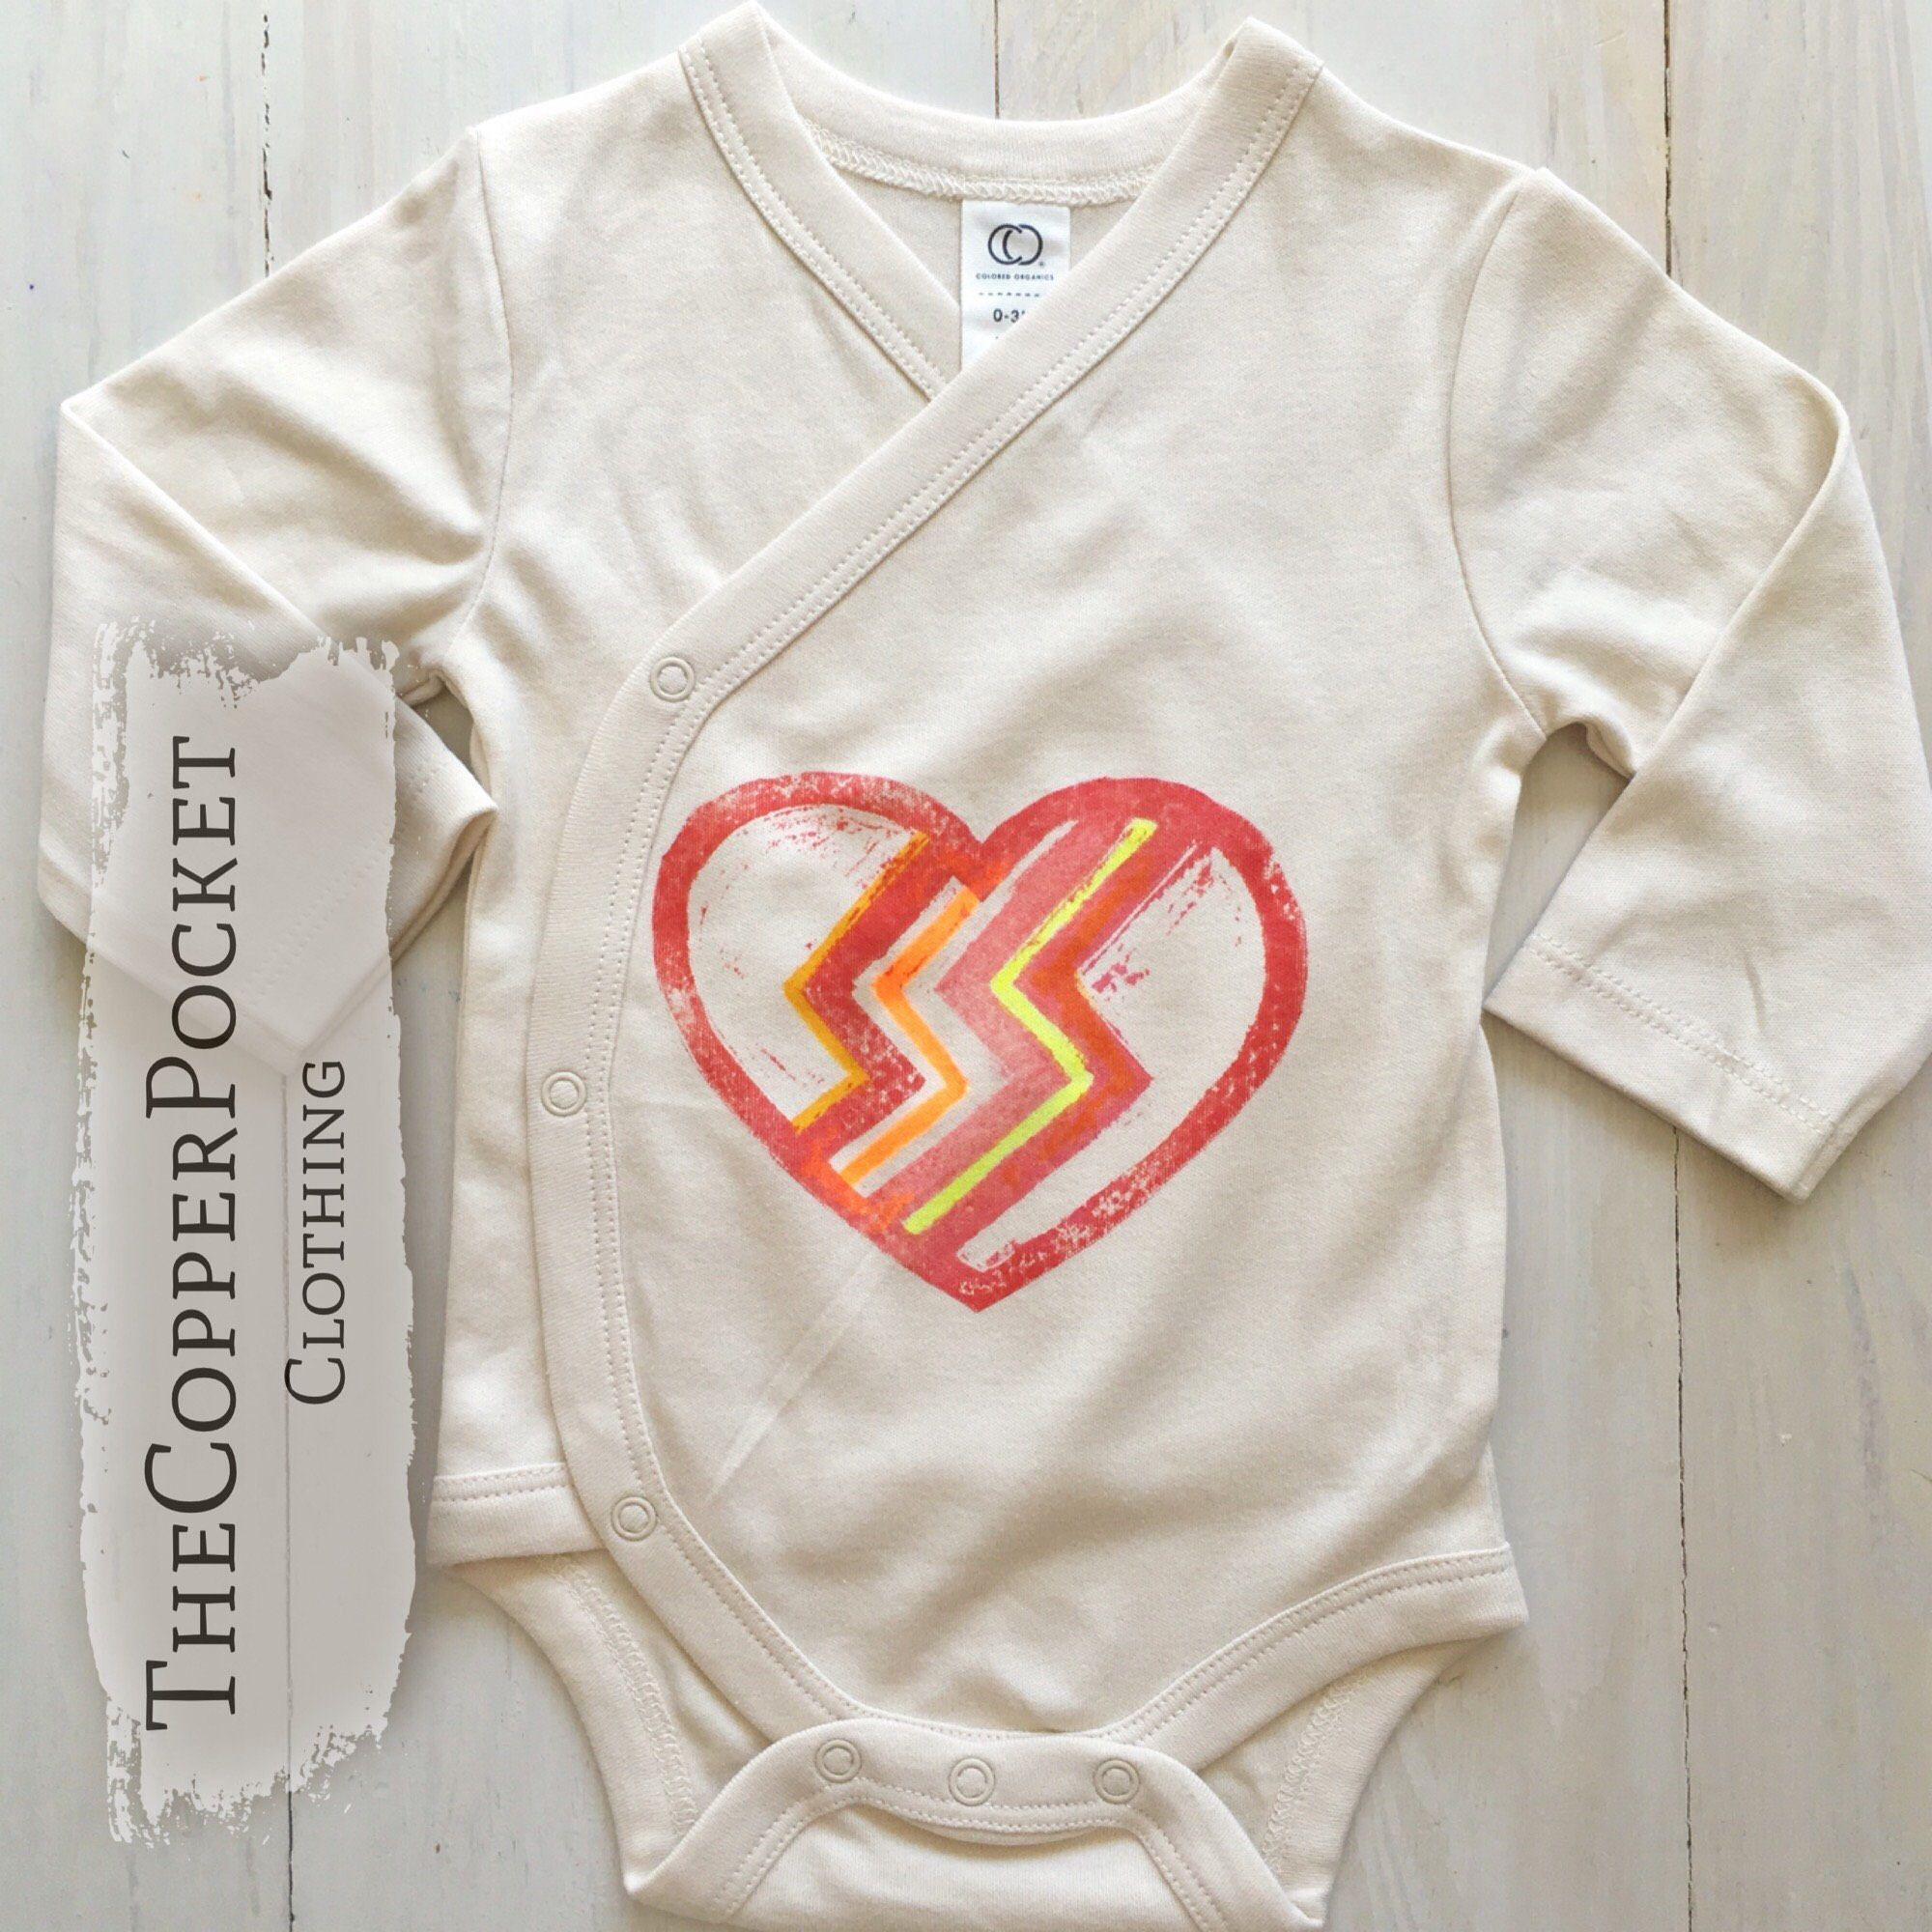 Retro heart organic baby clothes onesie bodysuit kimono wrap vegan